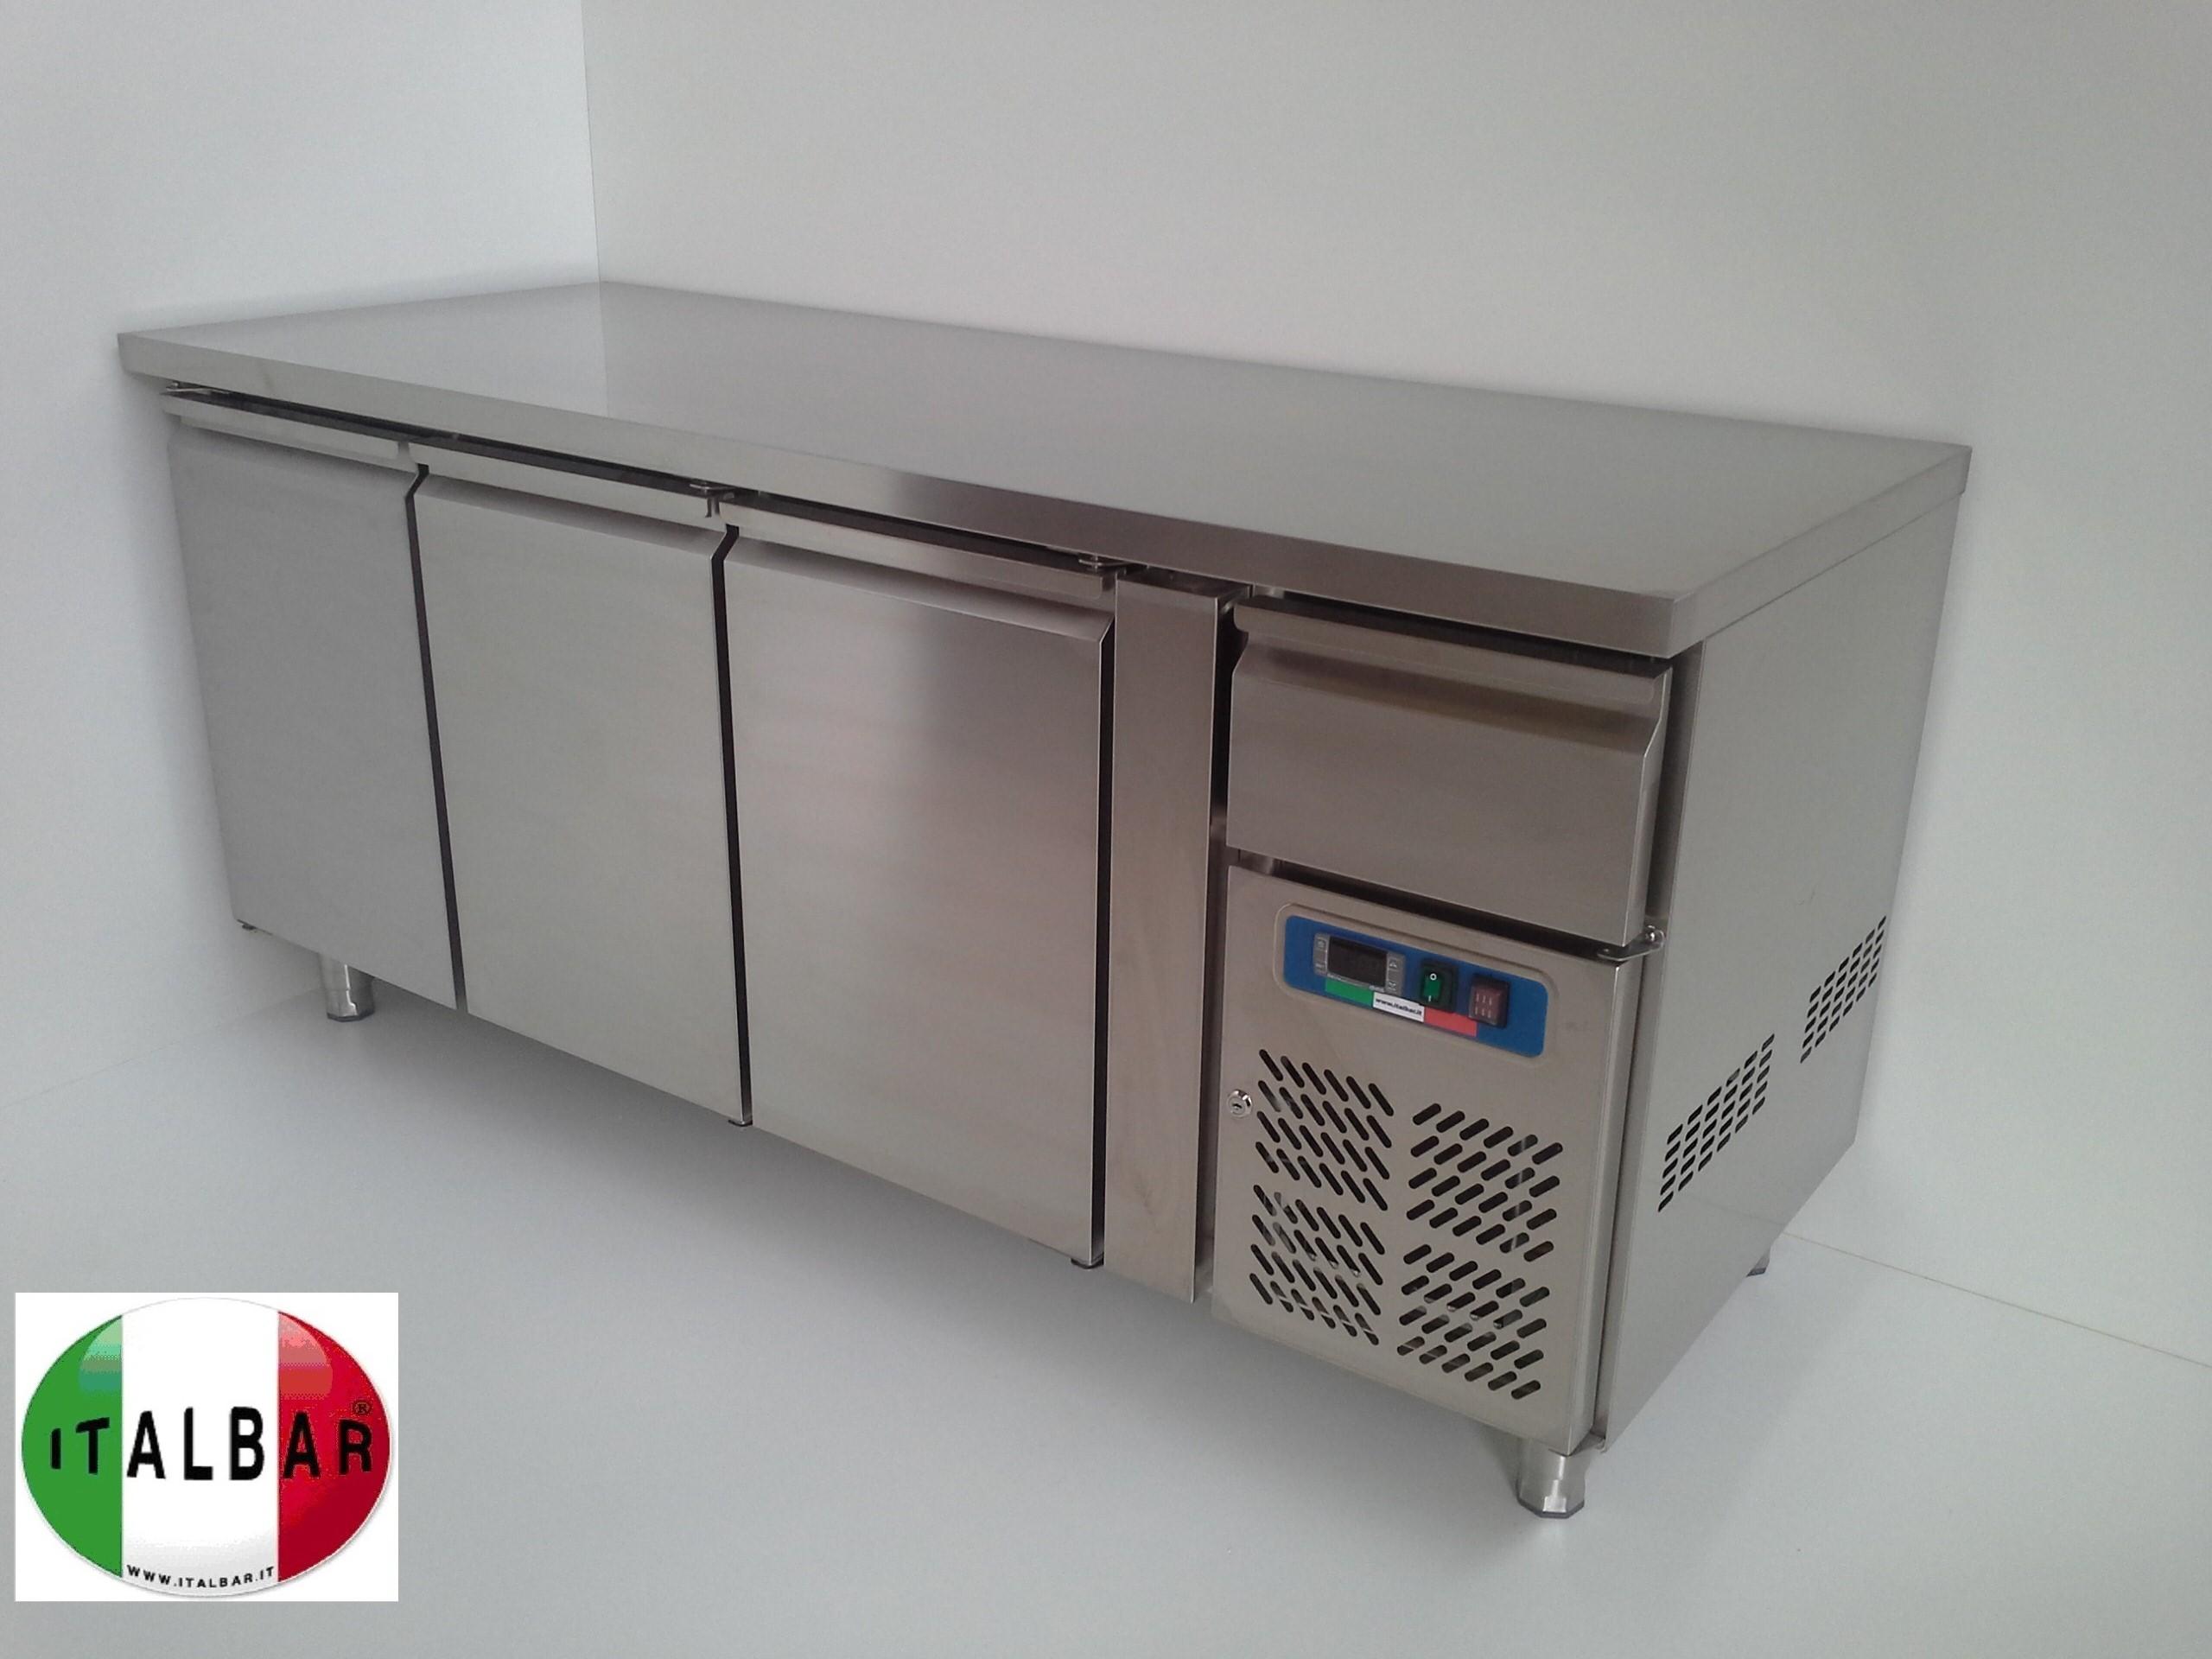 Motore banco frigo bar colonna porta lavatrice - Frigo da tavolo usato ...